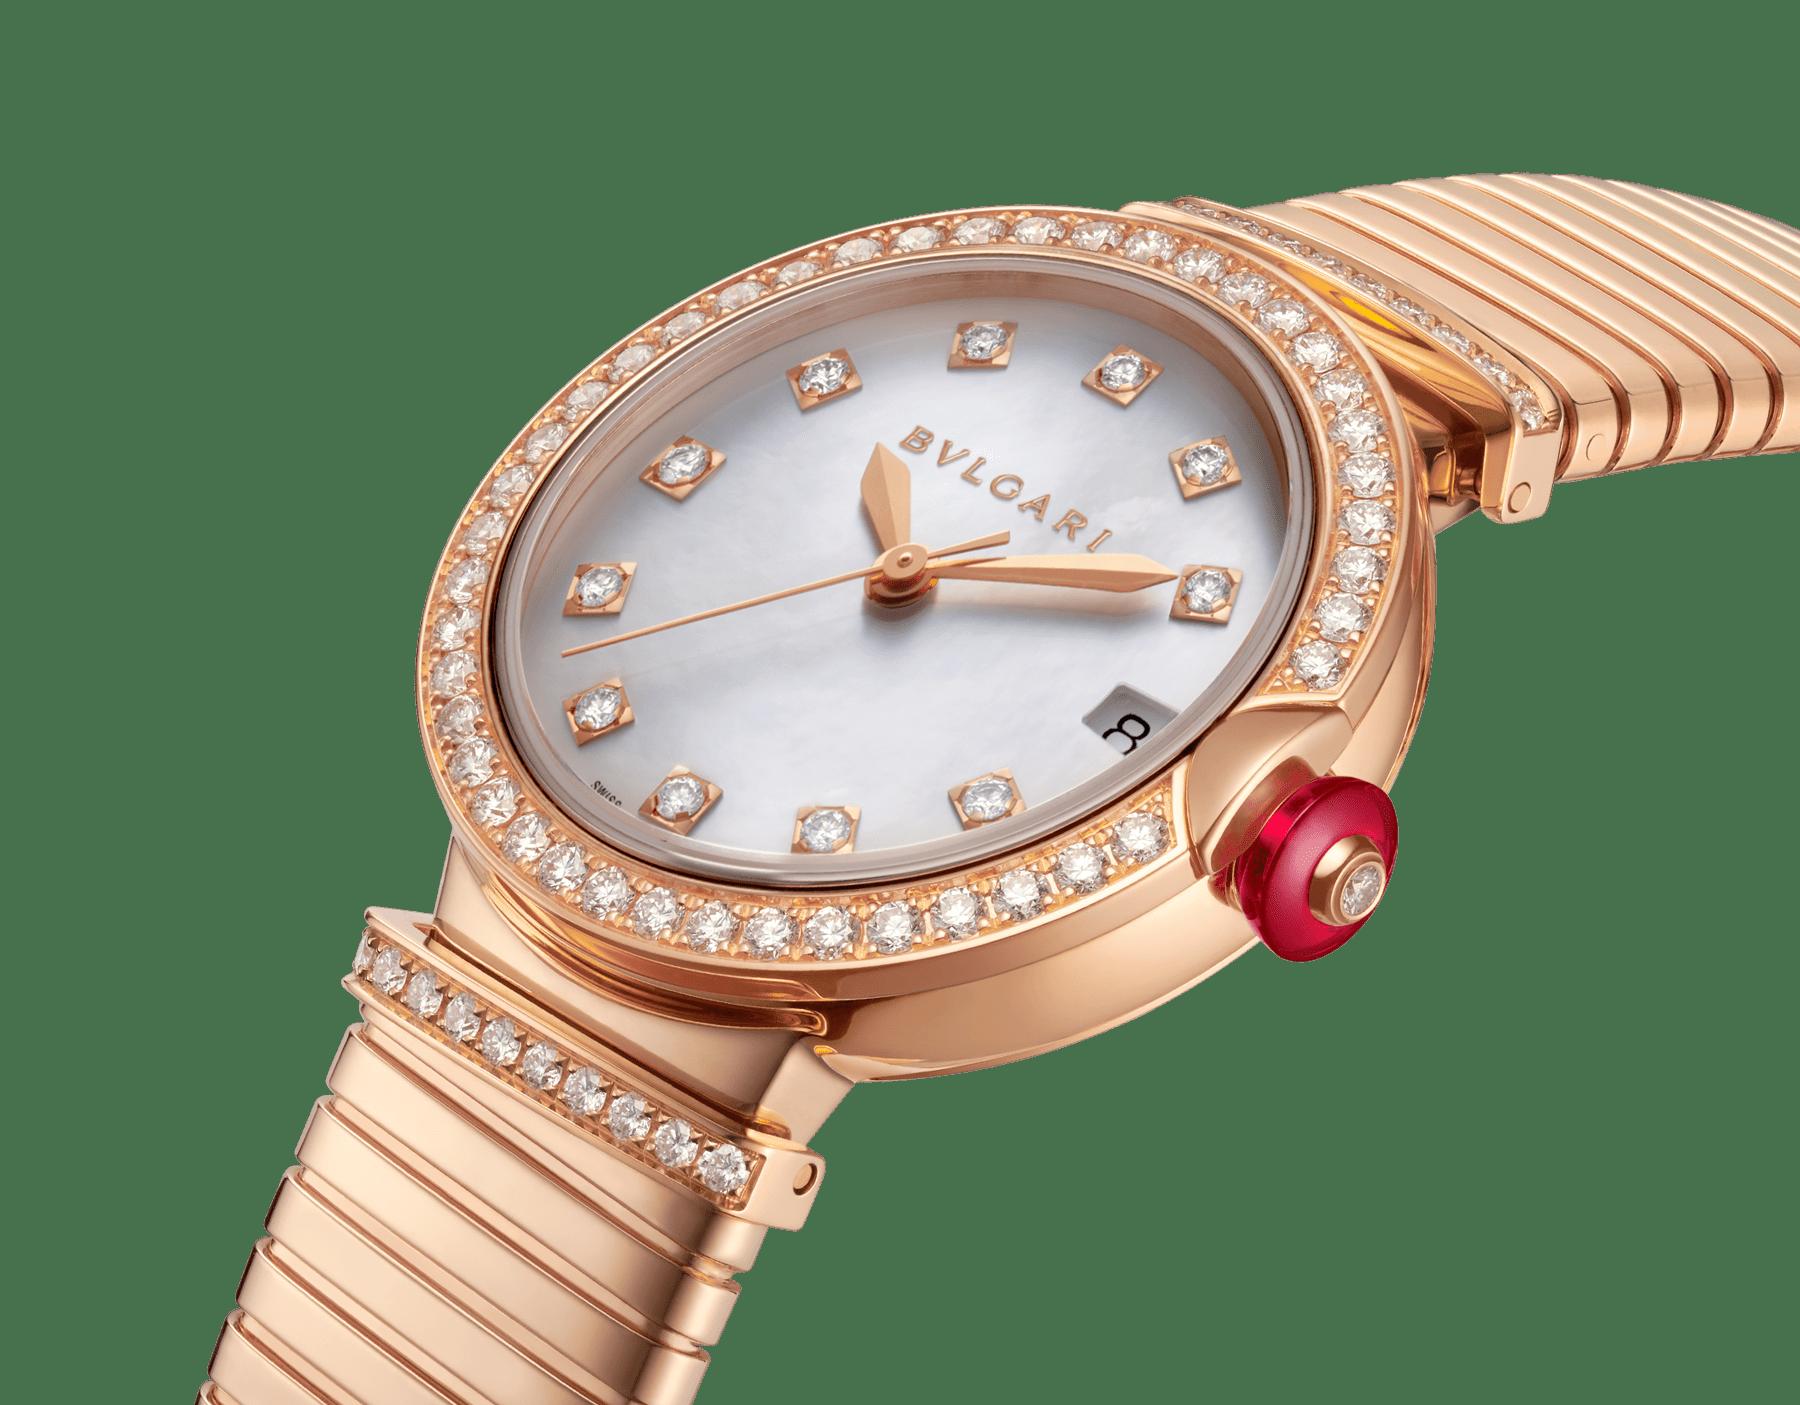 Reloj LVCEA Tubogas con caja en oro rosa de 18qt con diamantes engastados, esfera de madreperla blanca, diamantes engastados como índices y brazalete tubogas en oro rosa de 18qt. 103034 image 2